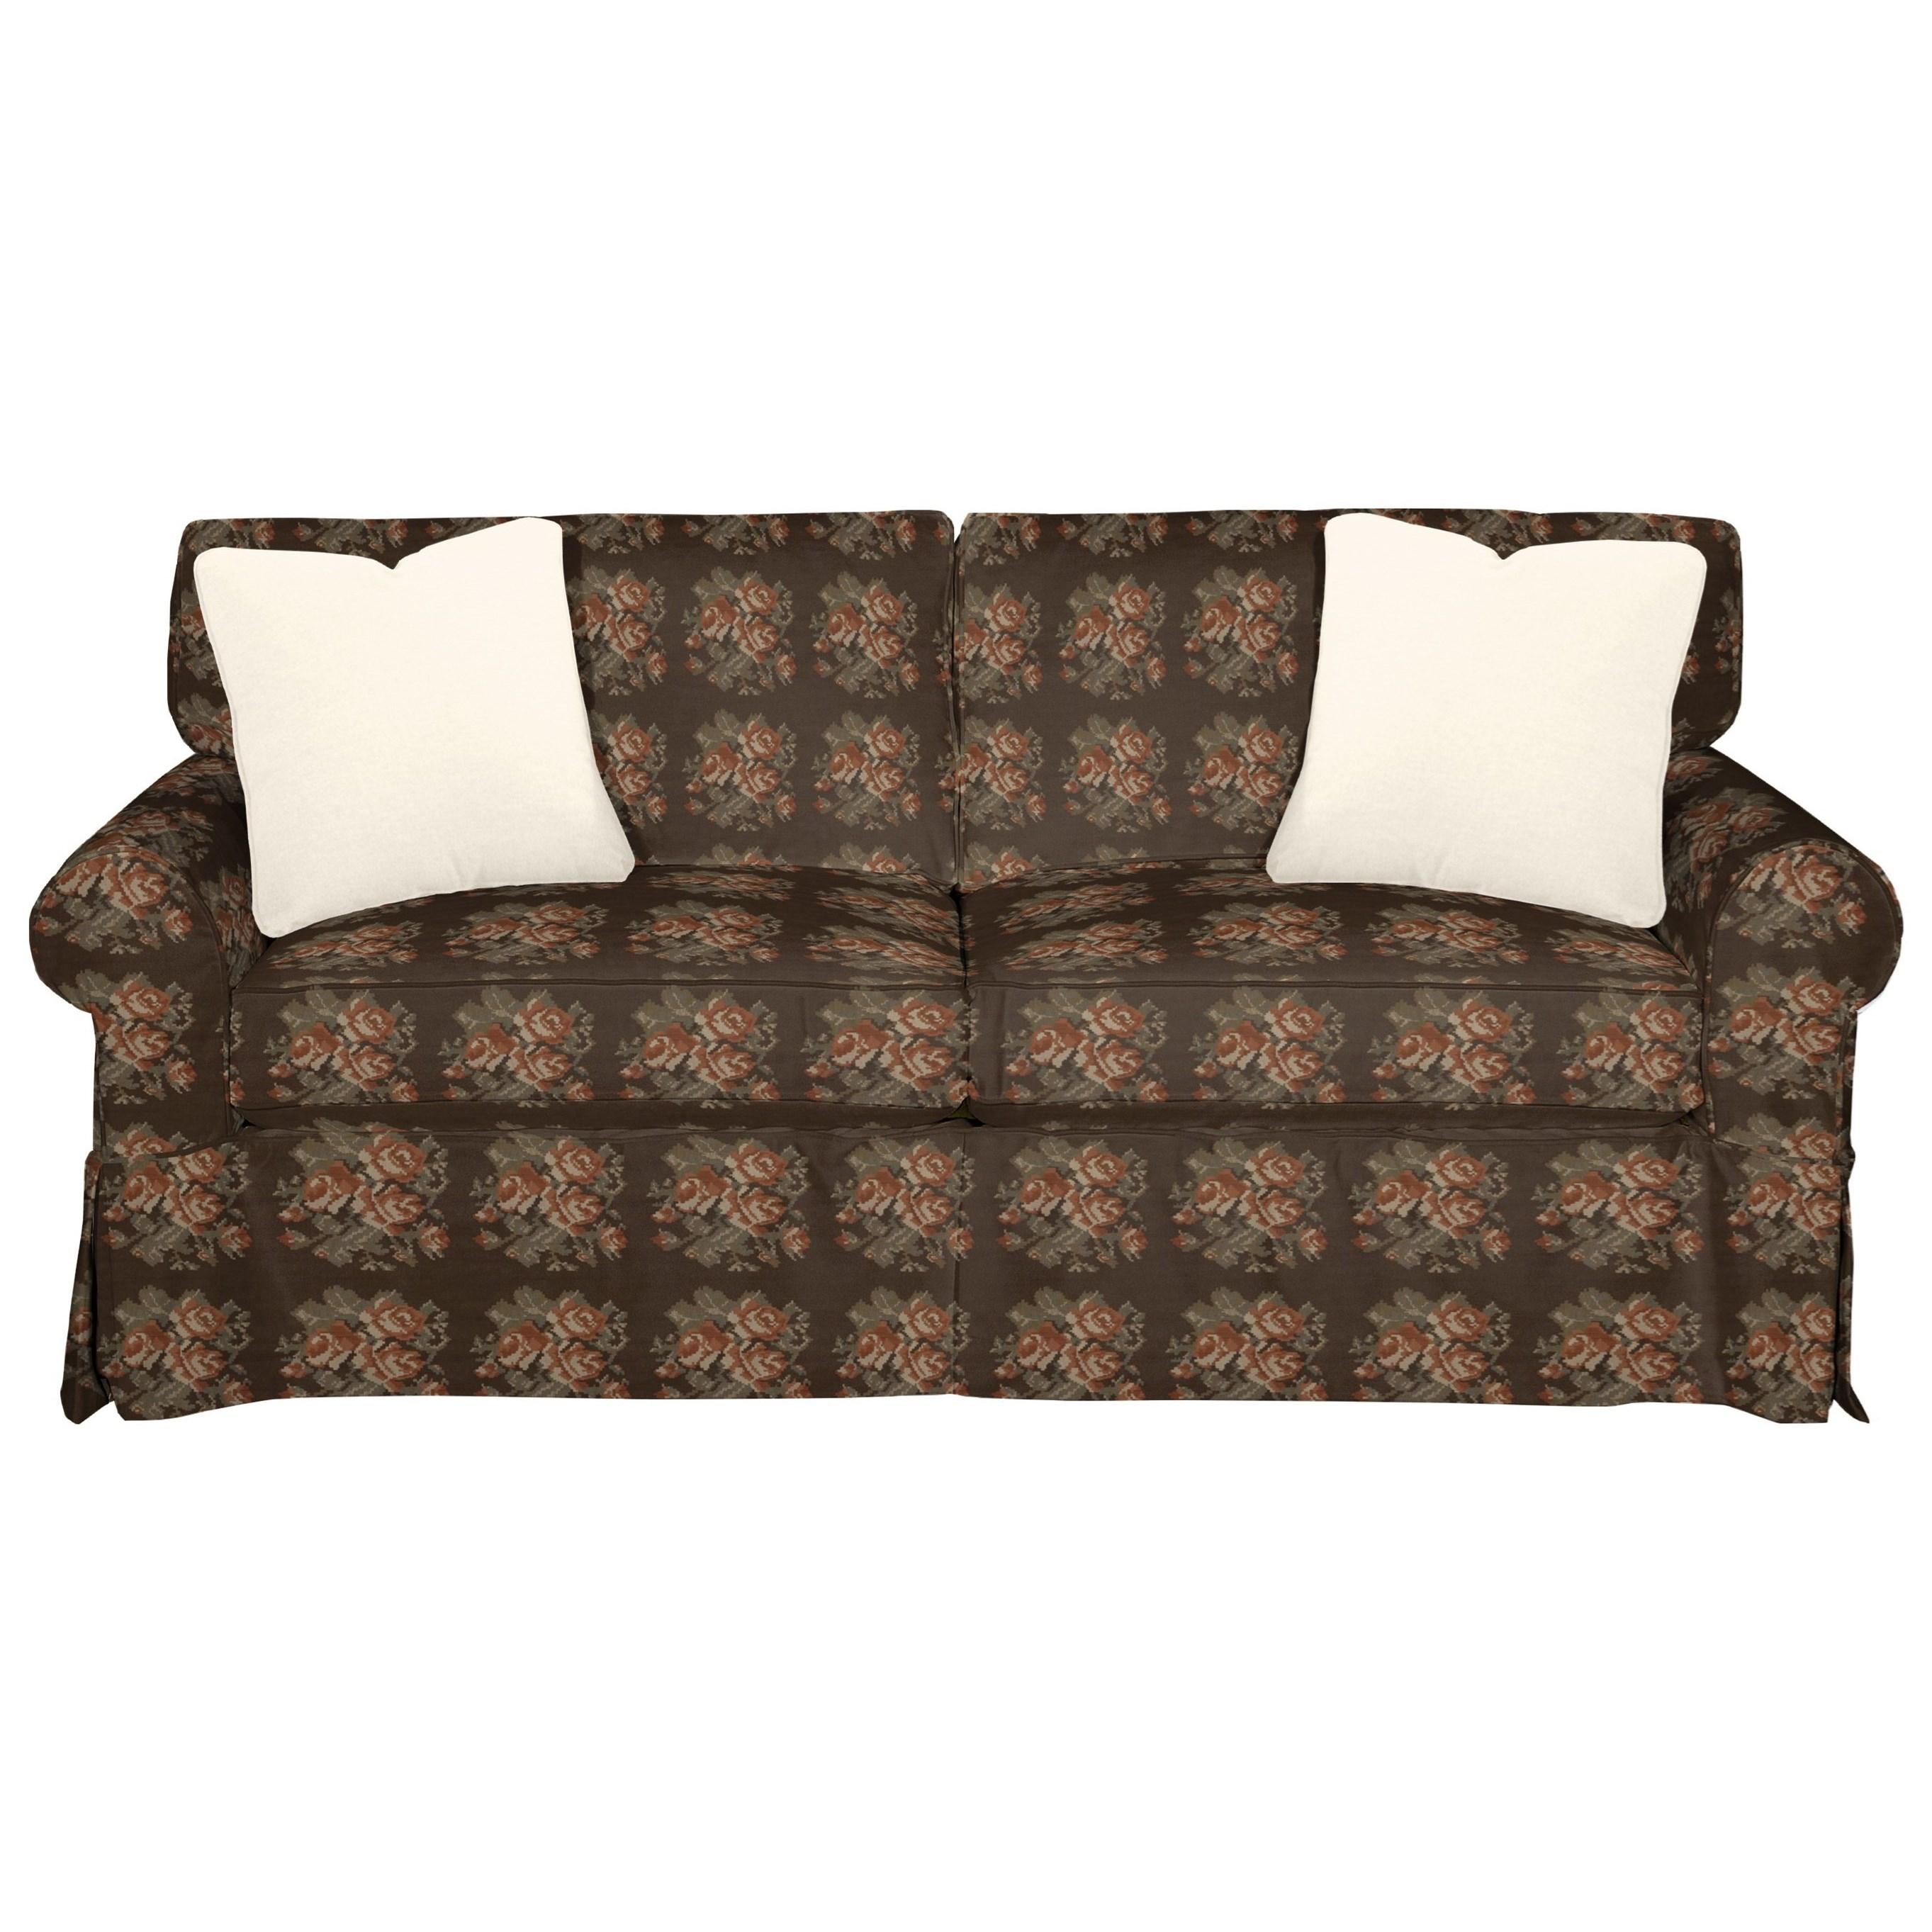 9228 Sleeper Sofa w/ Innerspring Mattress by Craftmaster at Bullard Furniture